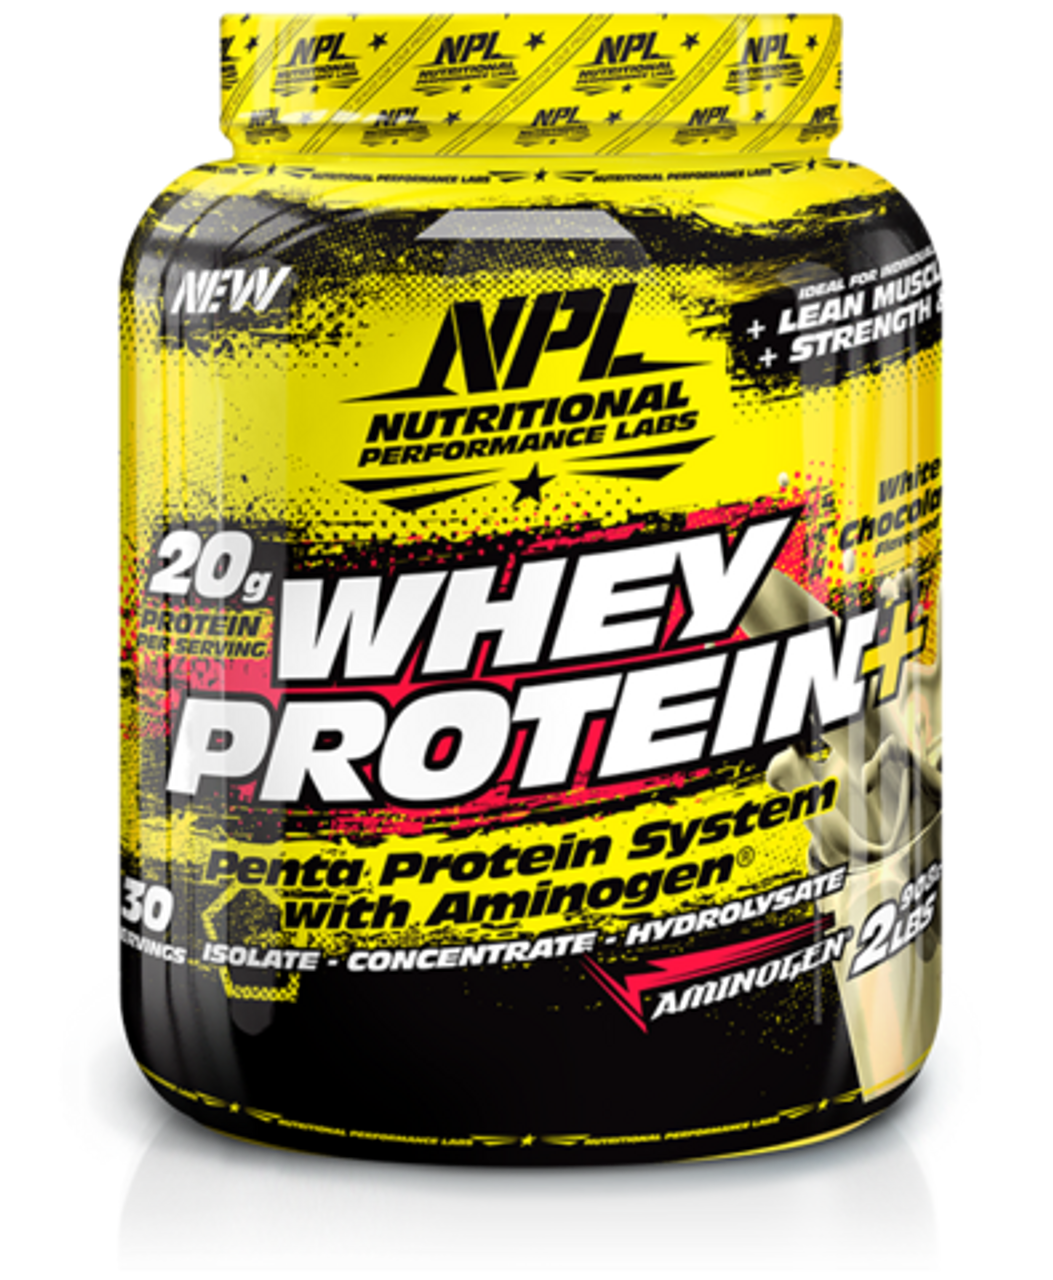 NPL Whey Protein White Chocolate